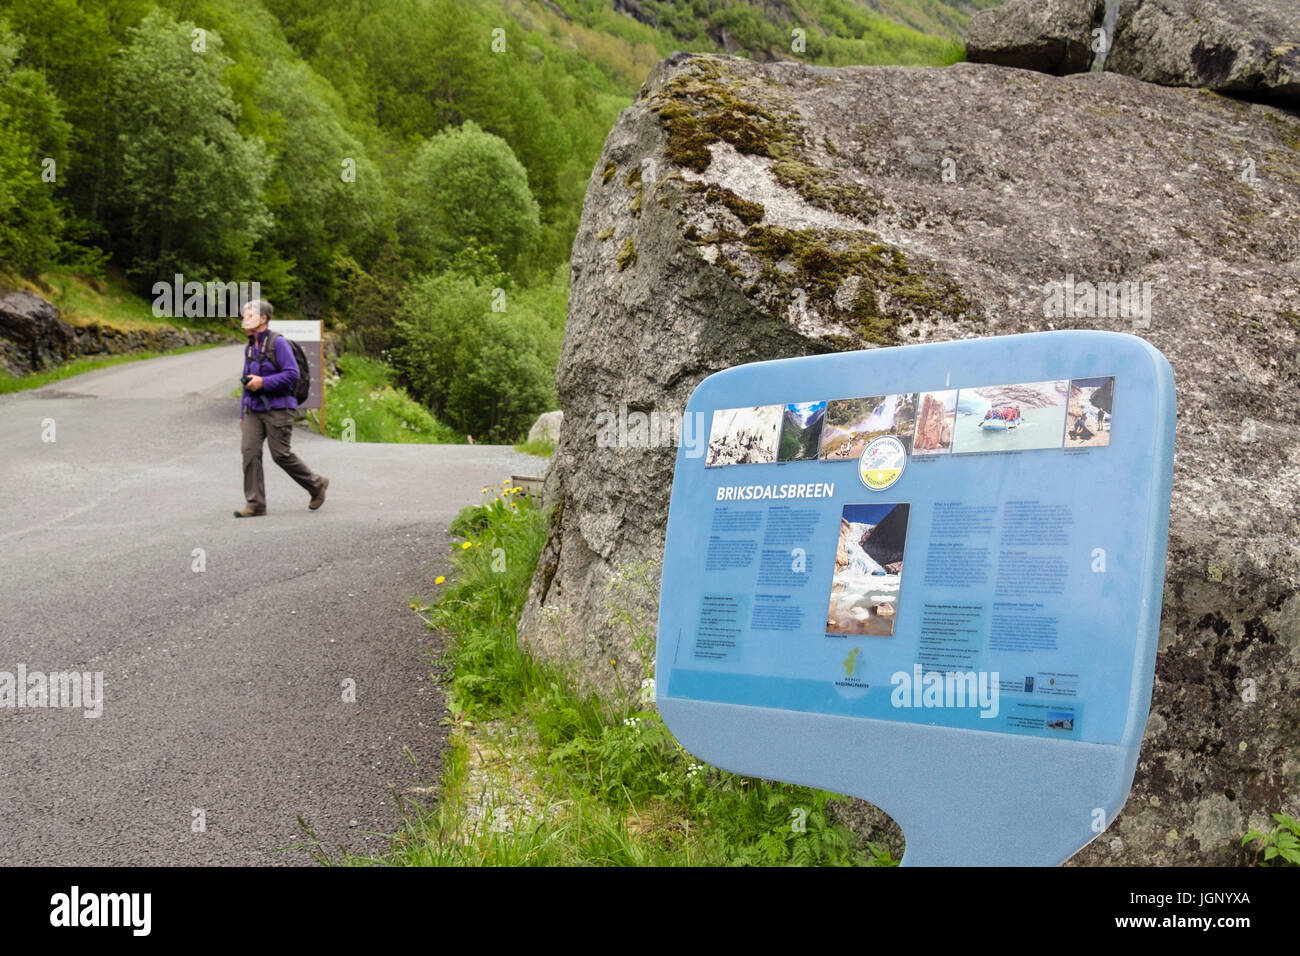 Information board about Briksdalsbreen or Briksdal glacier in Jostedalsbreen National Park. Briksdalen or Briks - Stock Image